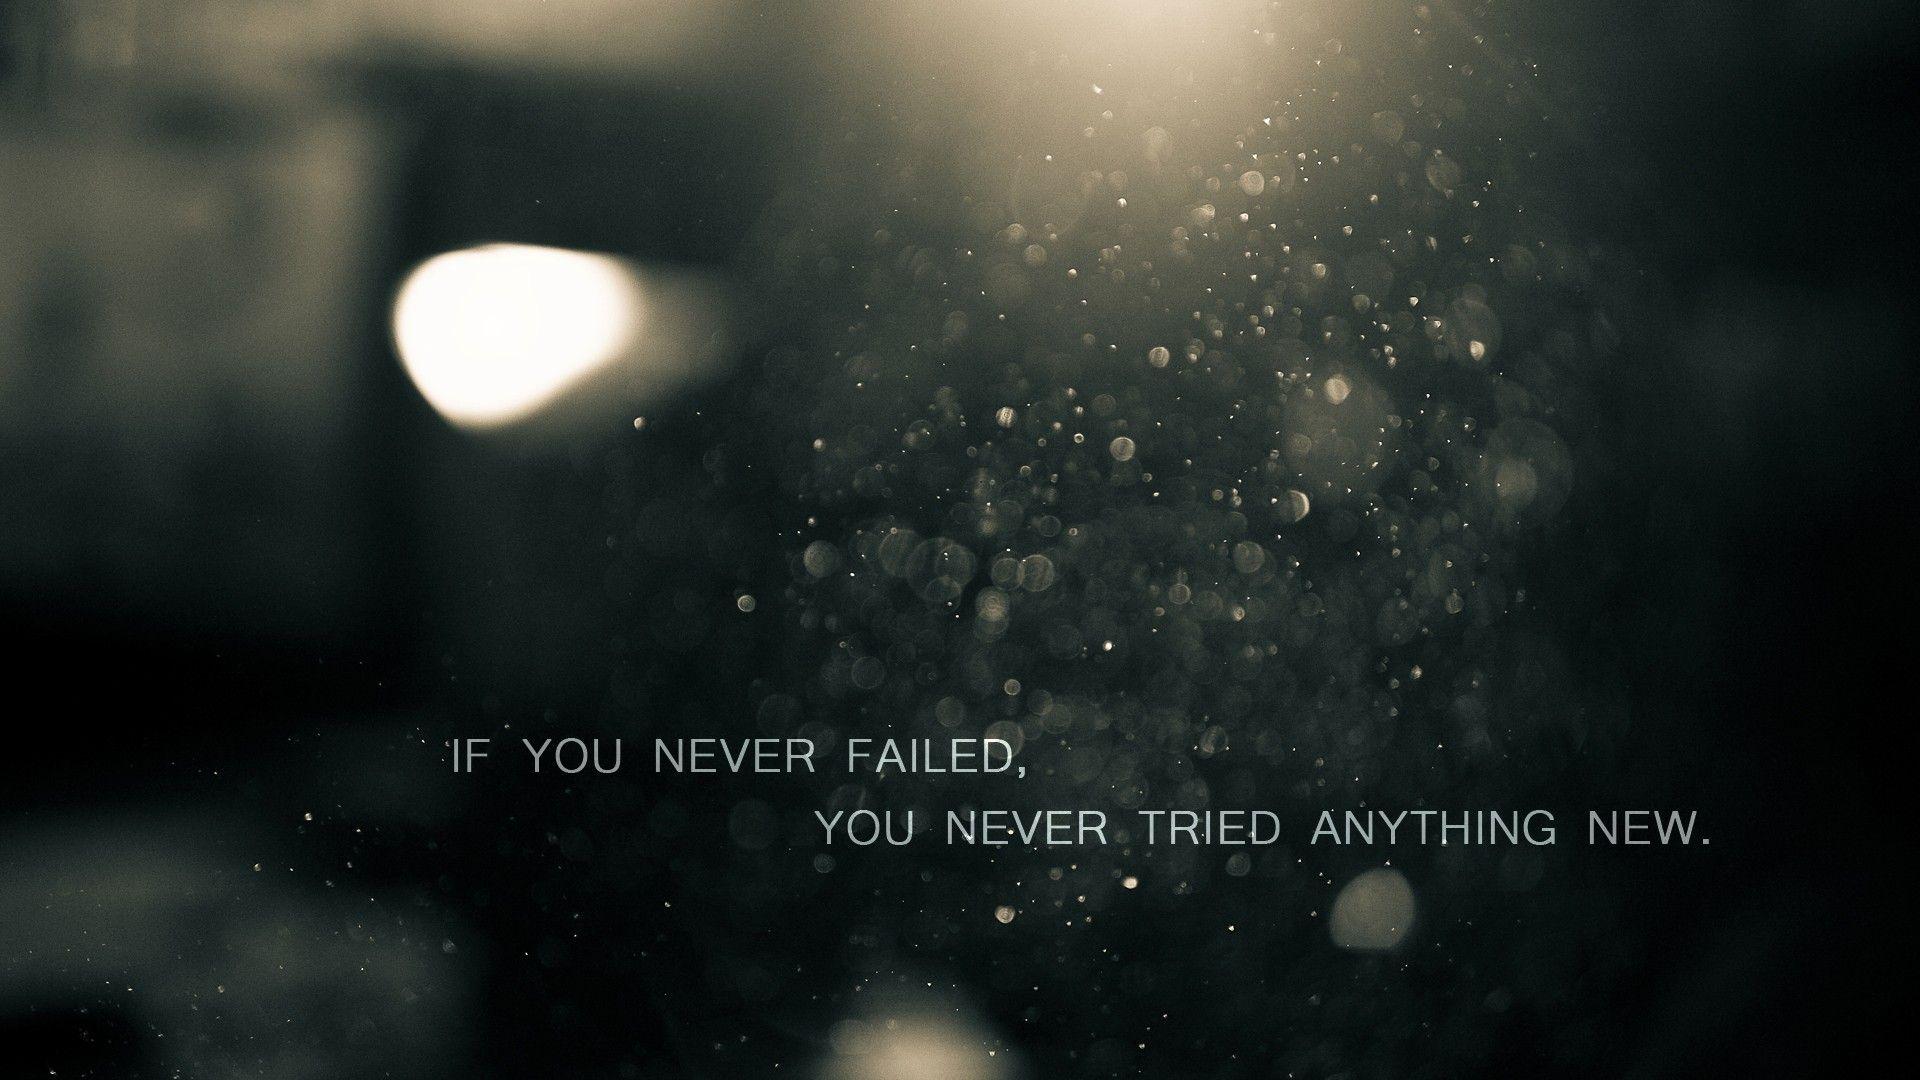 Pin By Near On Motivation Misc Motivational Pictures Motivational Picture Quotes Motivational Wallpaper